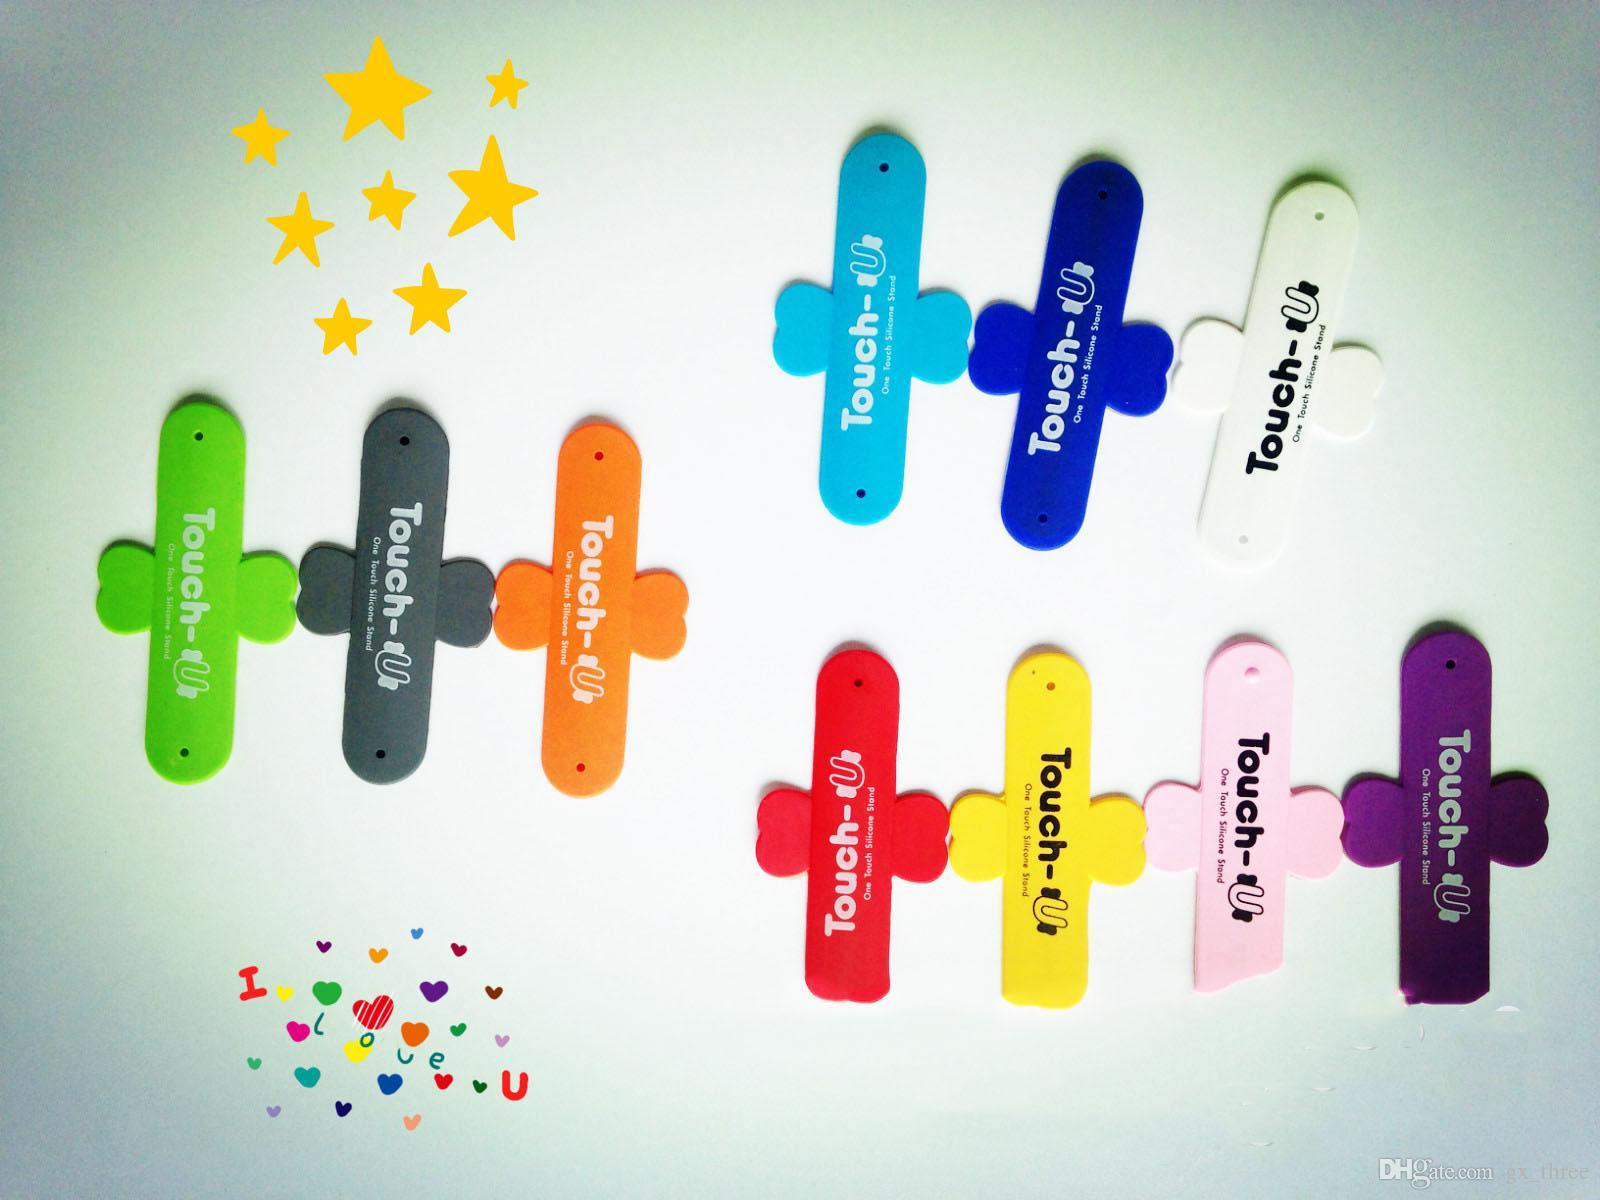 Tragbarer Südkorea-Noten-U-Form Telefon-Stent-Rückseitenpasten-Halter 3M Aufkleber-Noten-Silikon-Kreditkartenslot-Silikonstandplatz für iphone X 8